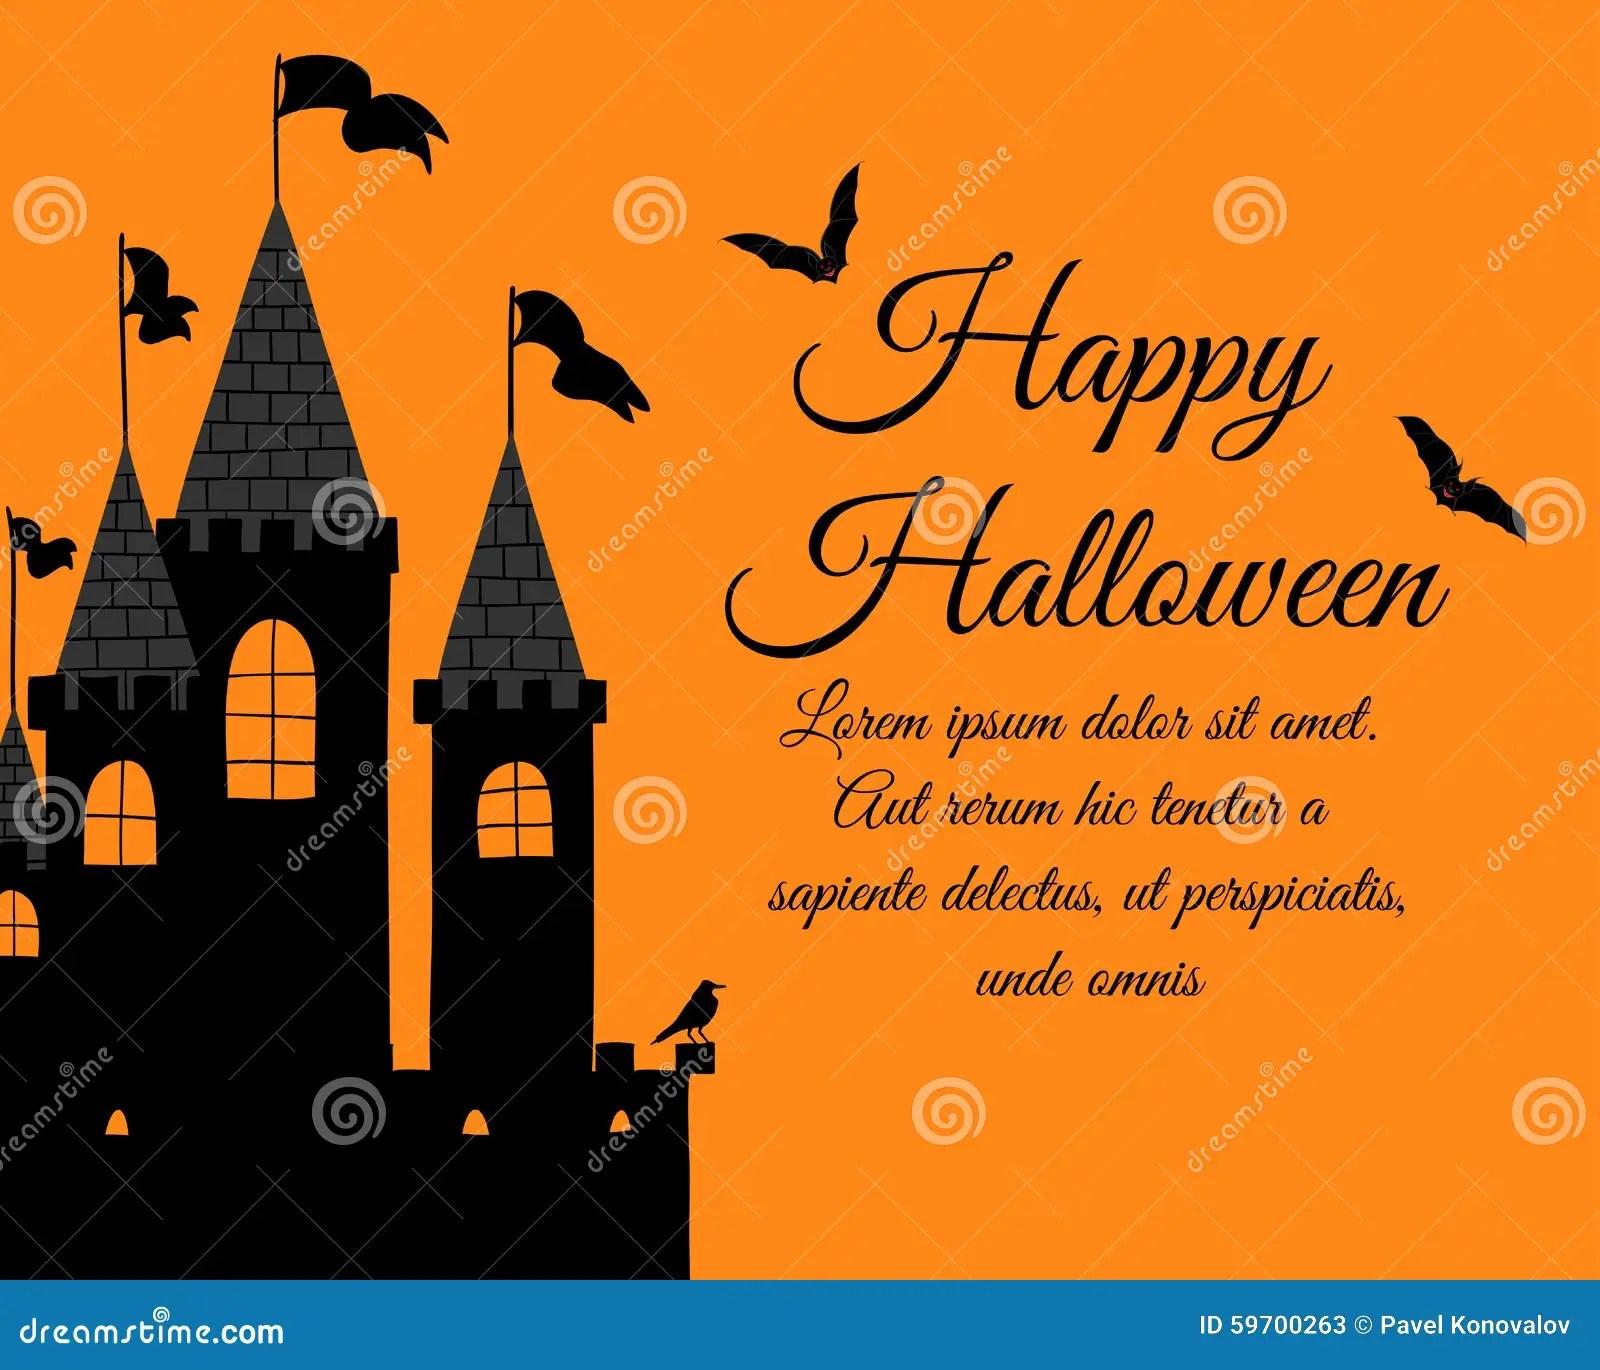 Halloween Greeting Card Stock Vector Illustration Of Hand